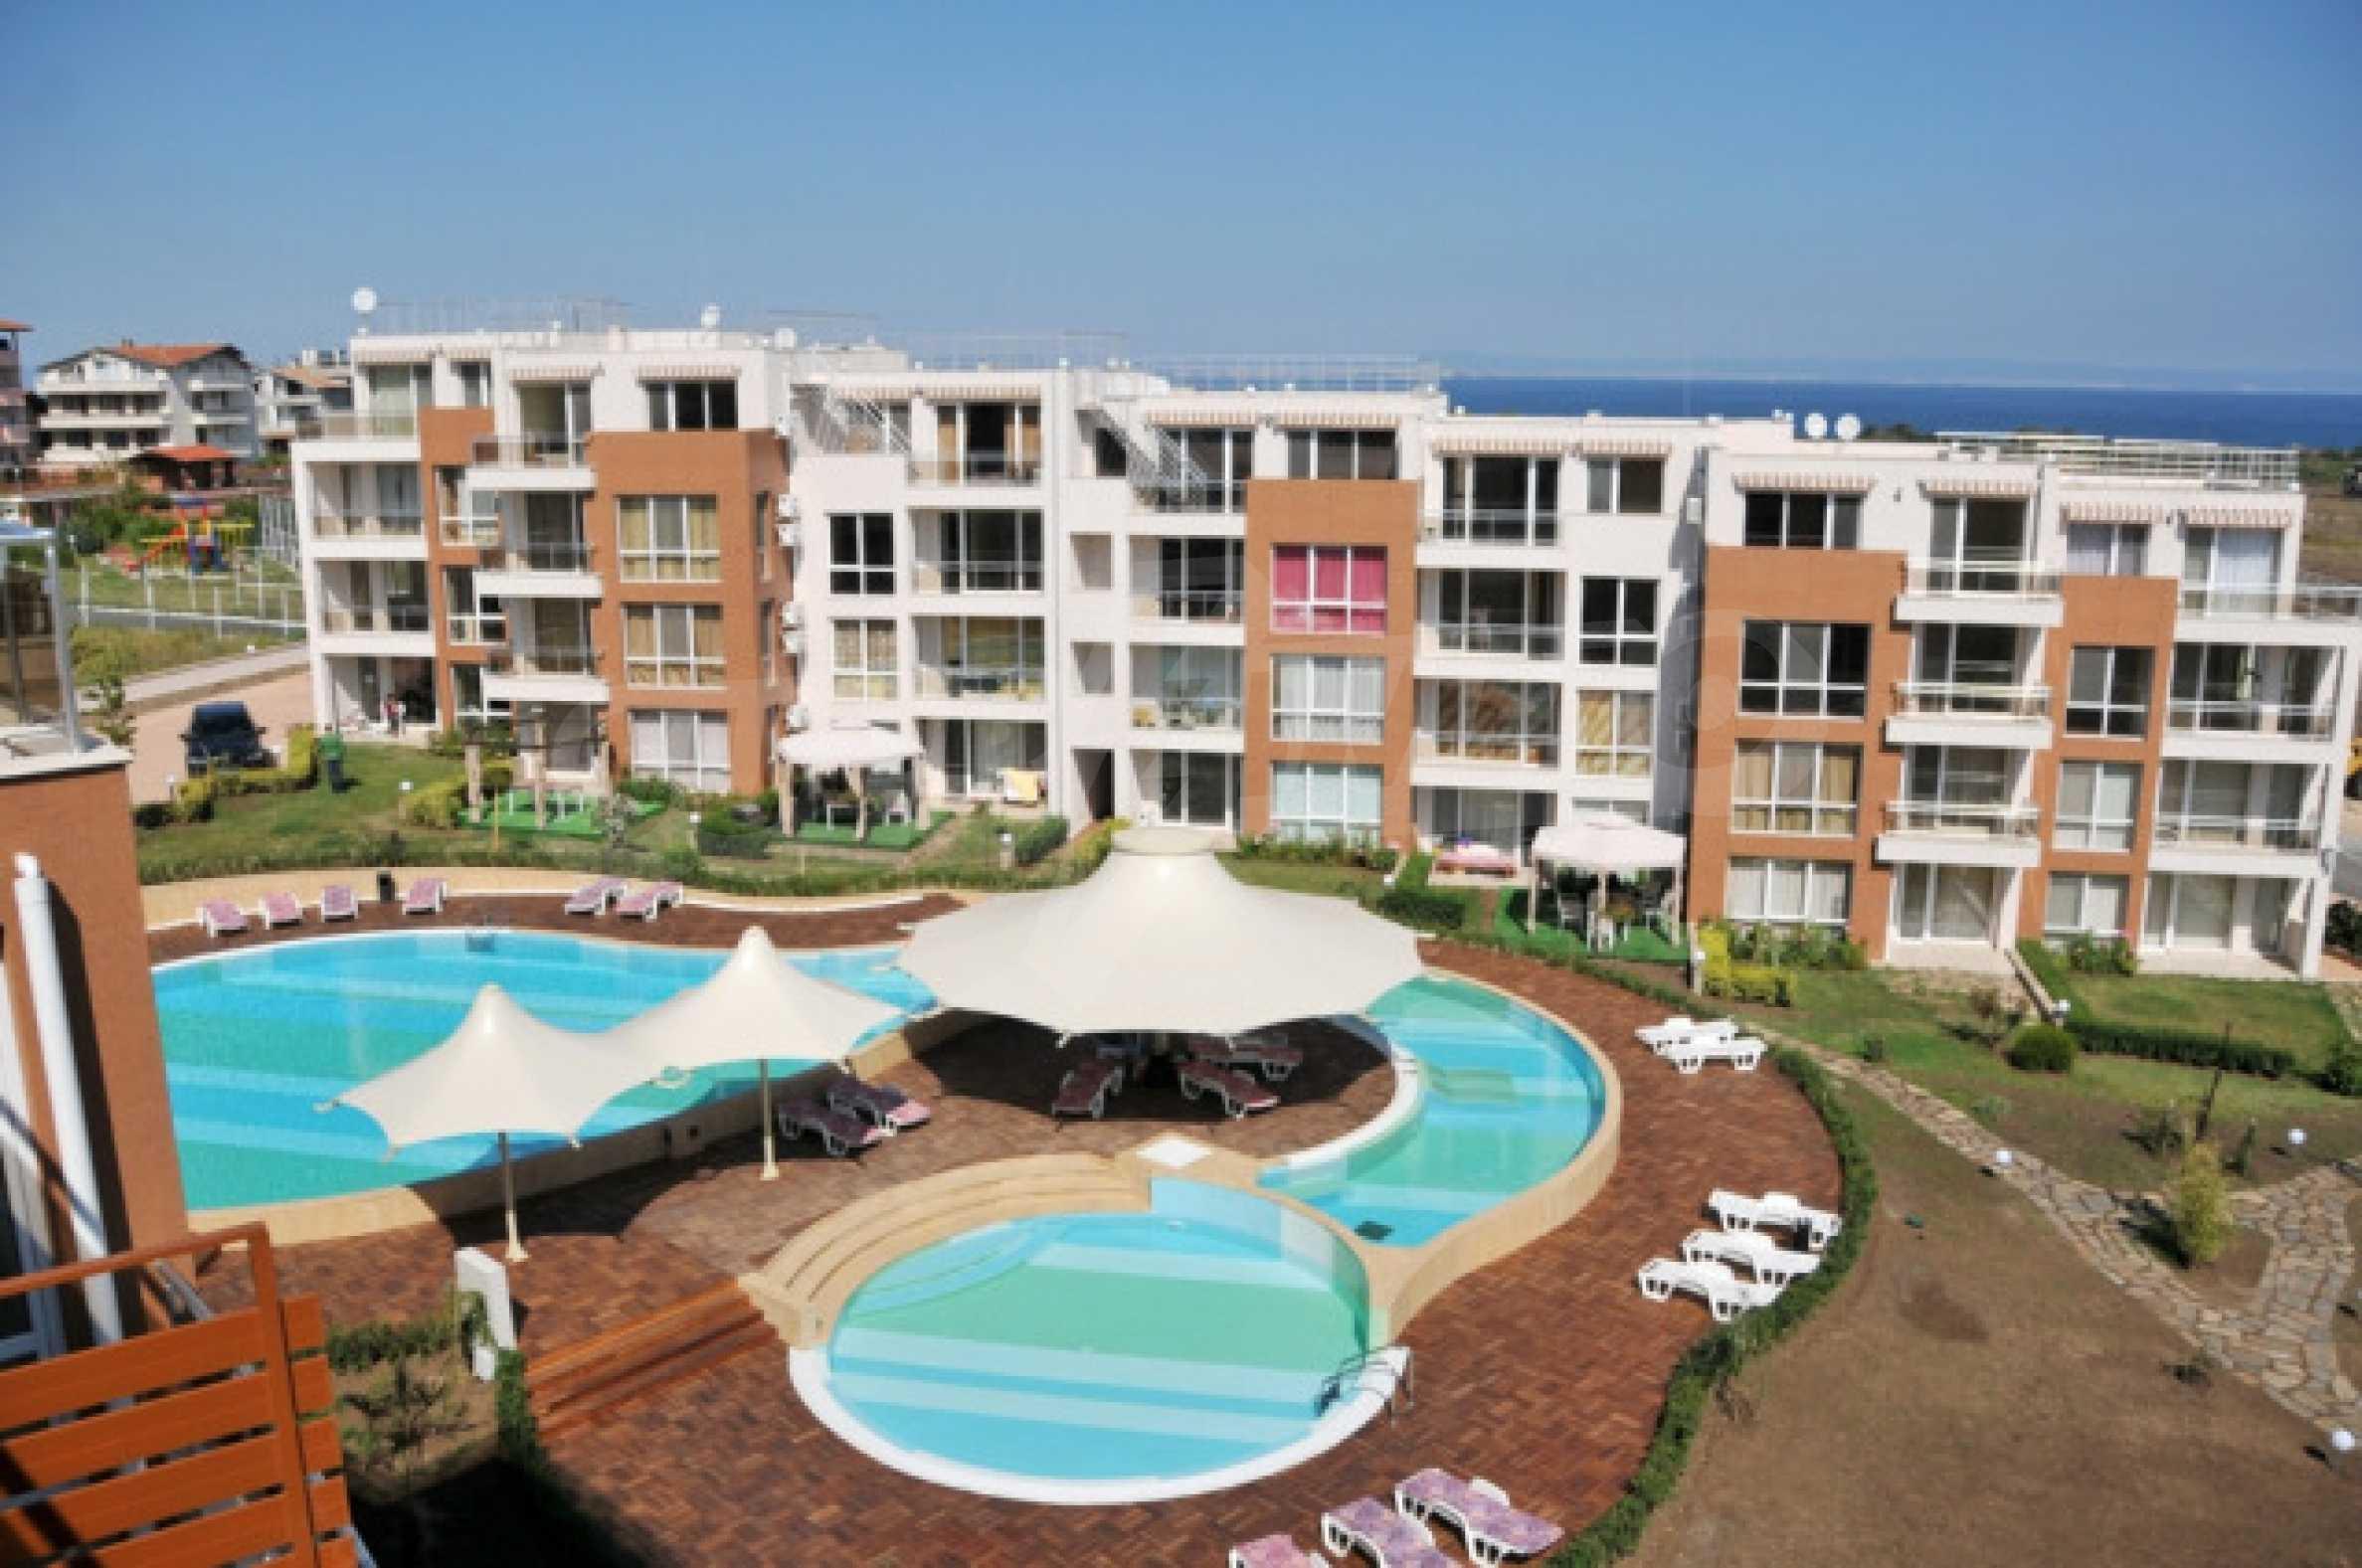 Комплекс Sunny Island в Черноморец 16